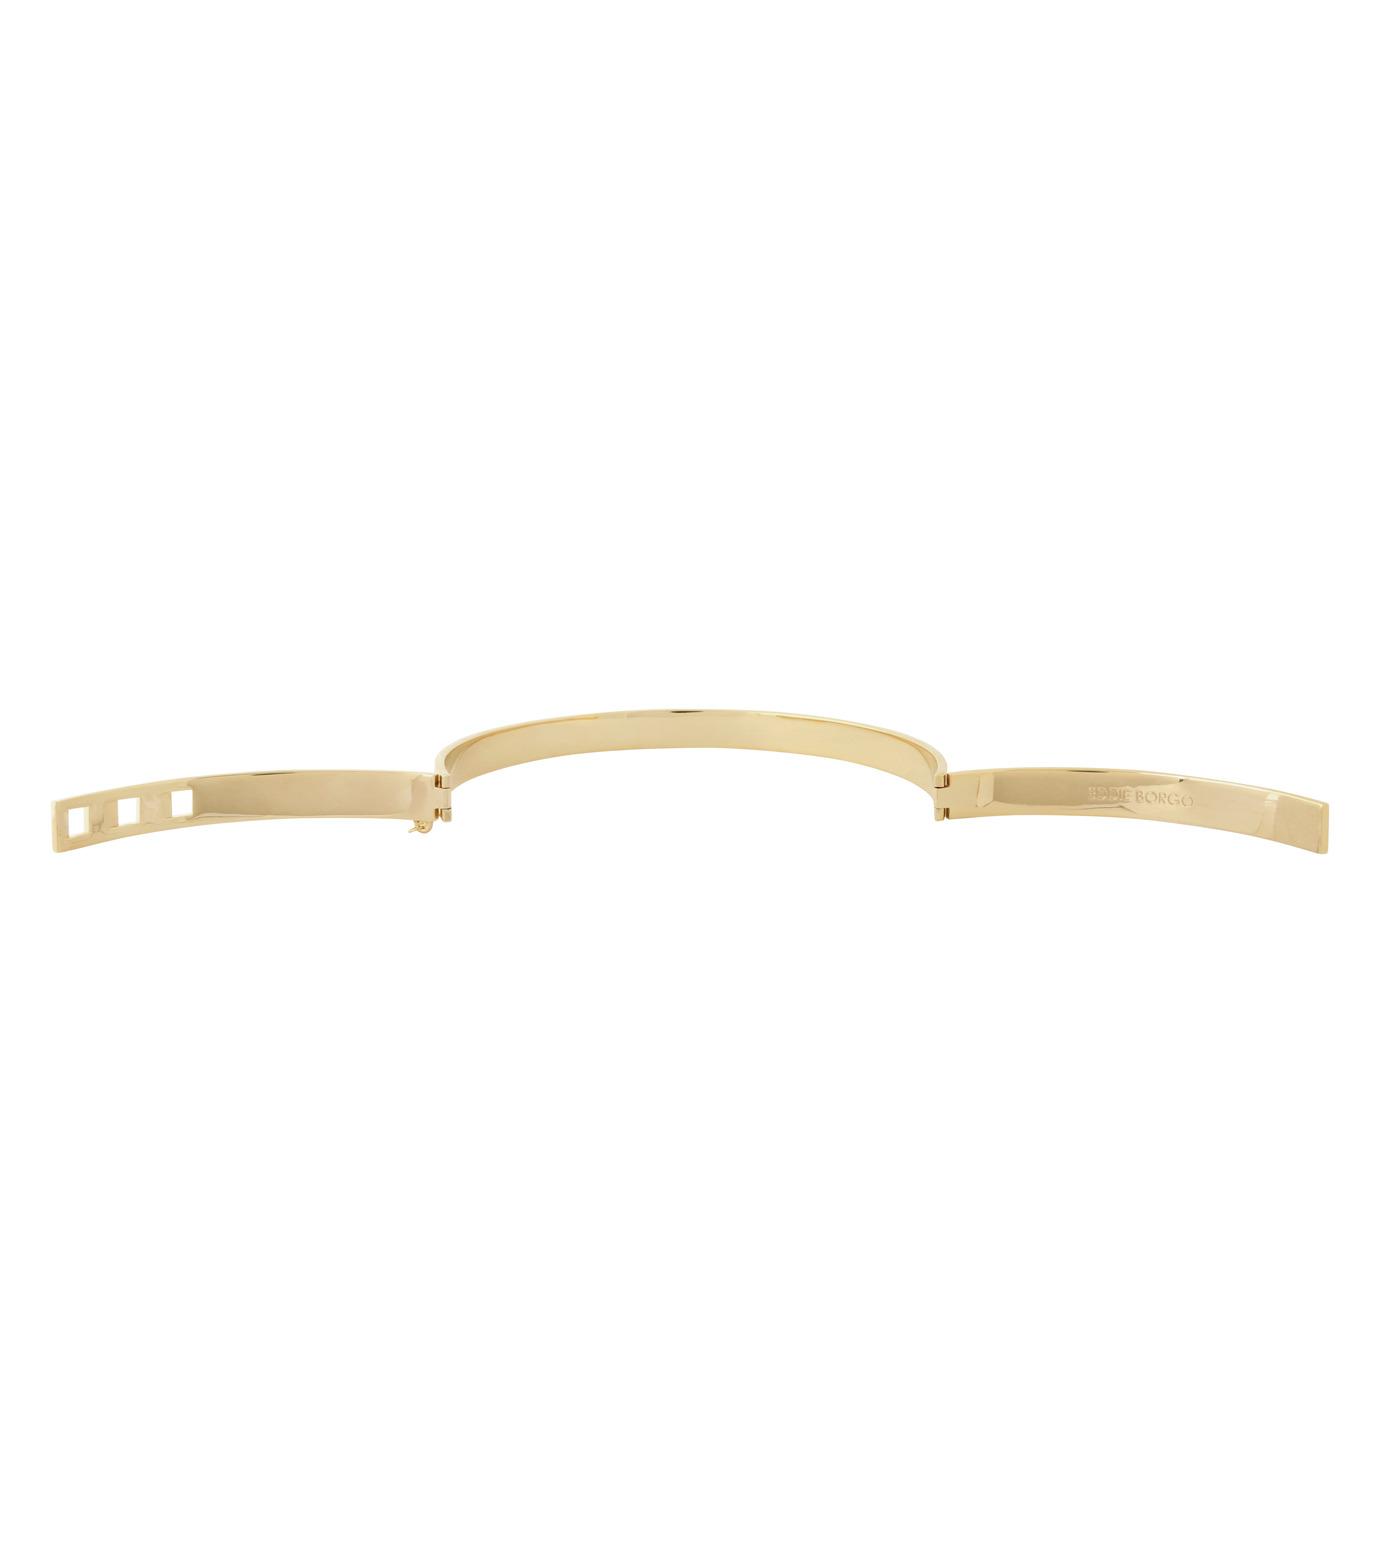 Eddie Borgo(エディ・ボルゴ)のSMALL SAFTY CHAIN CHOKER-GOLD(ネックレス/necklace)-CK1003-R-2 拡大詳細画像2